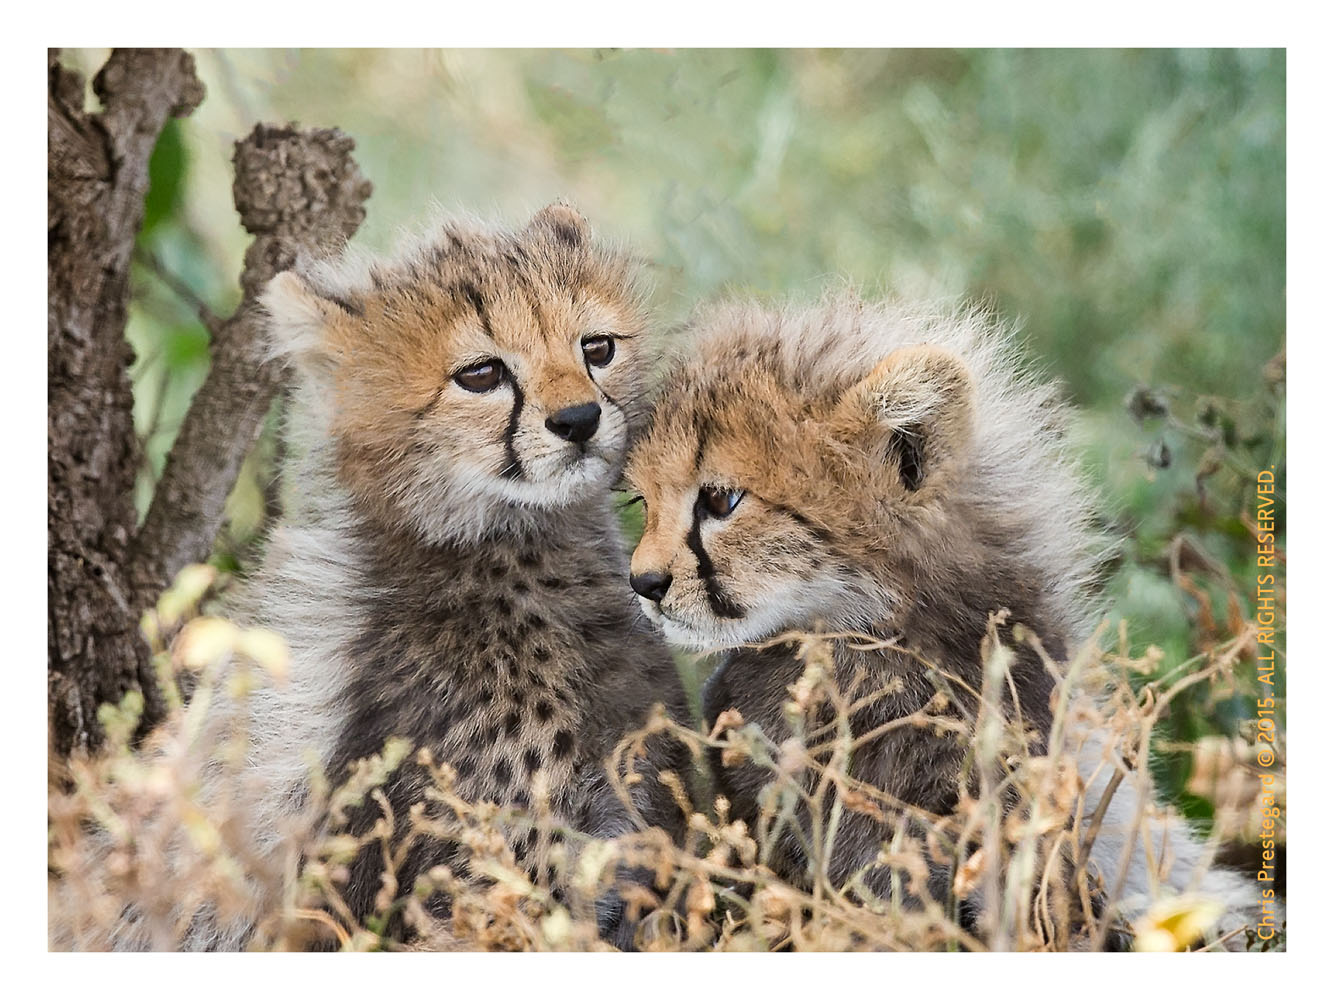 Cheetah 2802